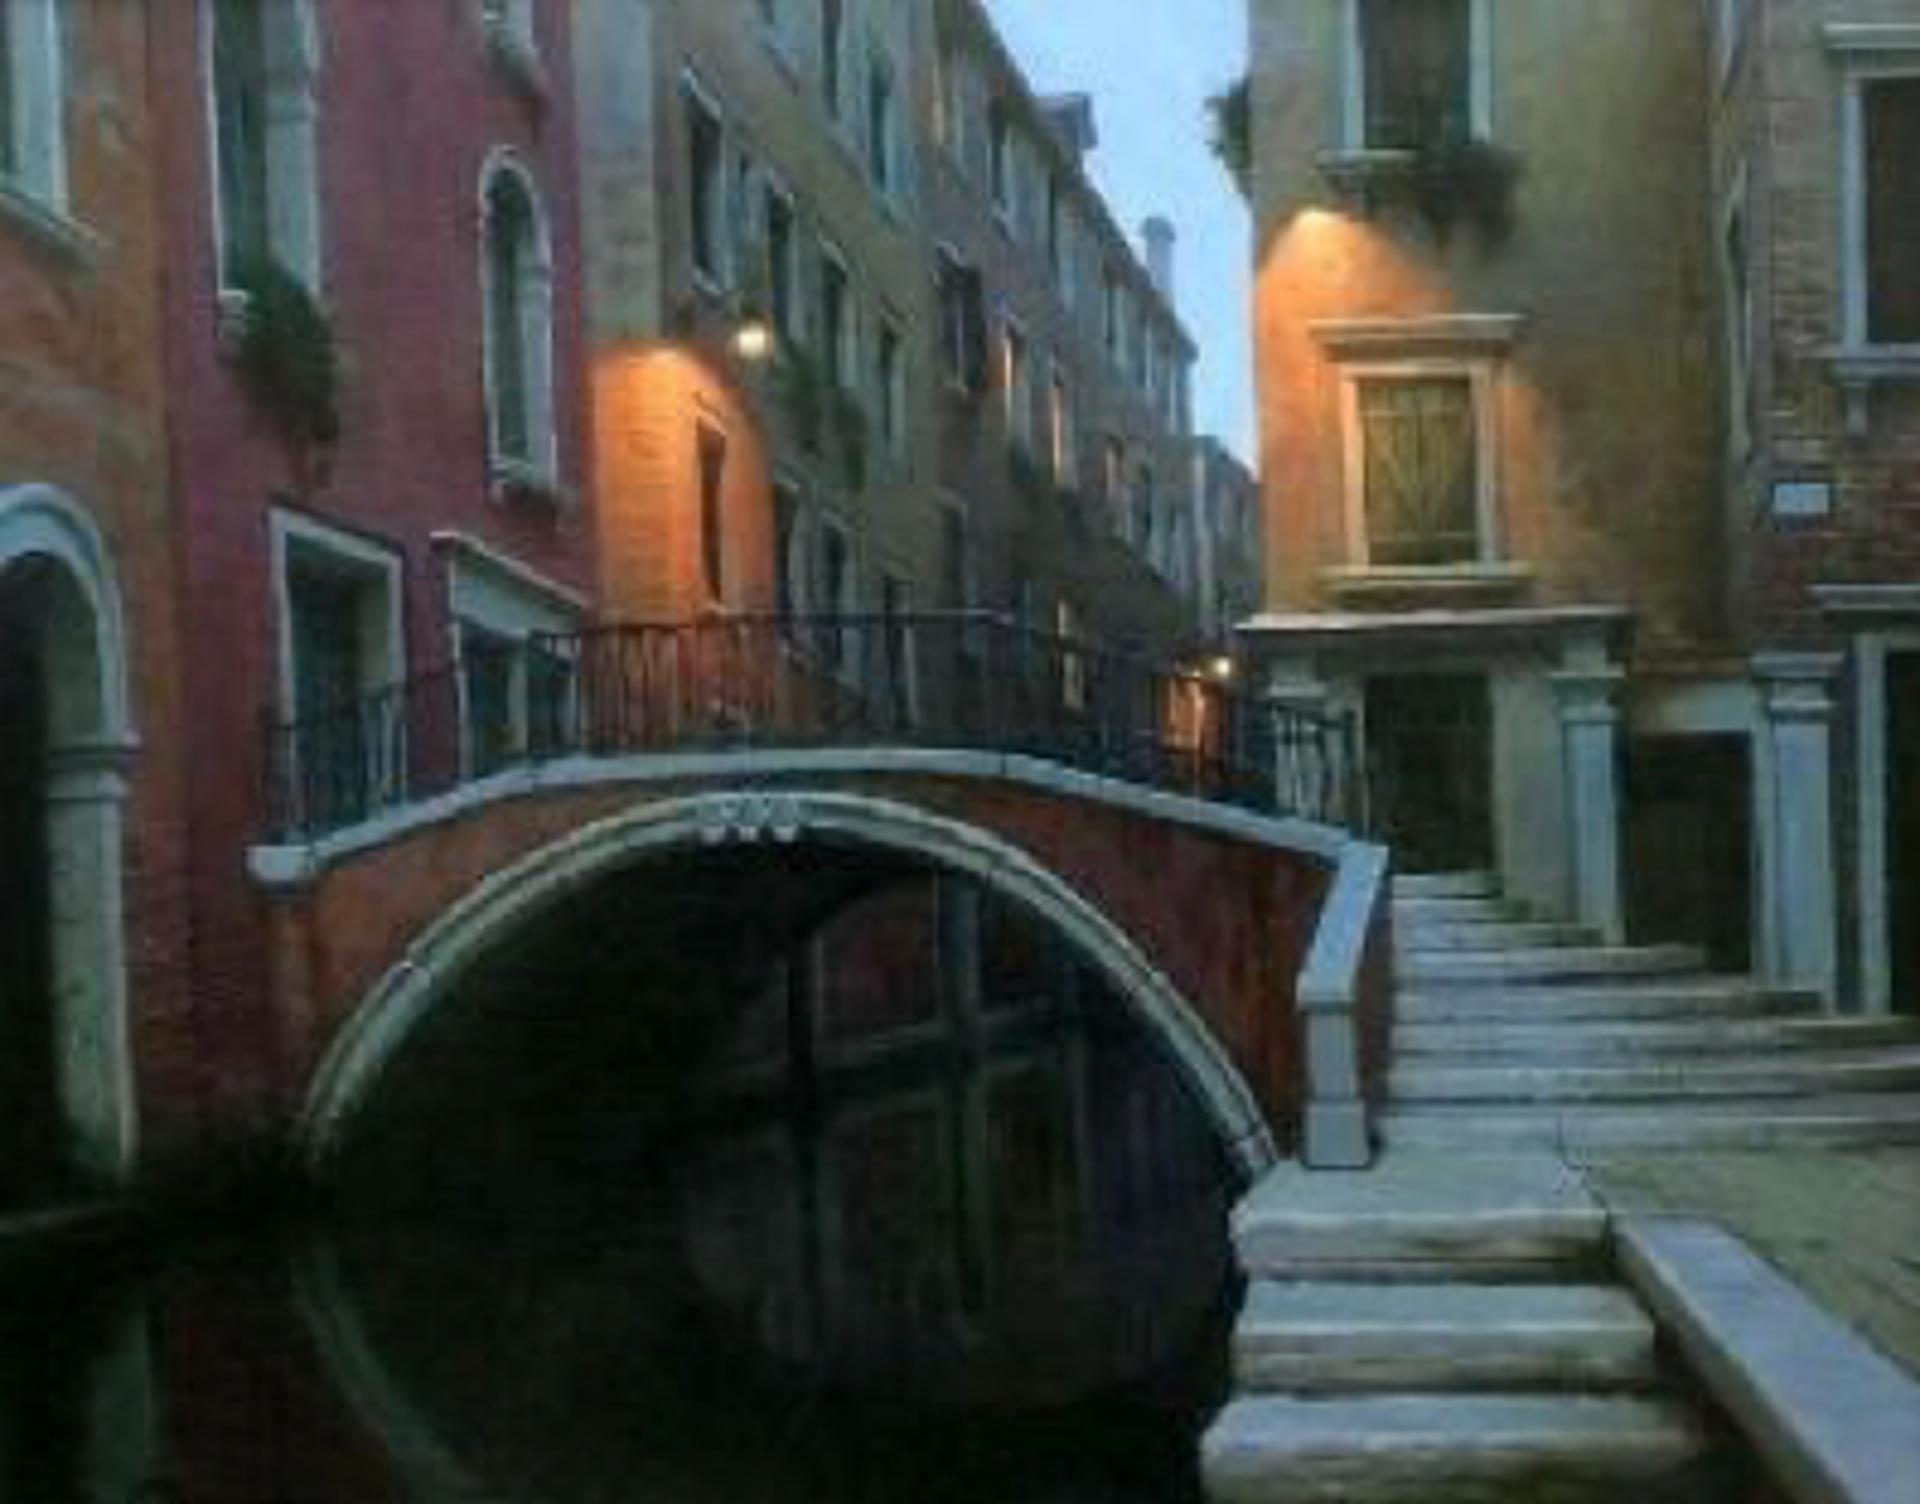 Song of Venice by Alexei Butirskiy